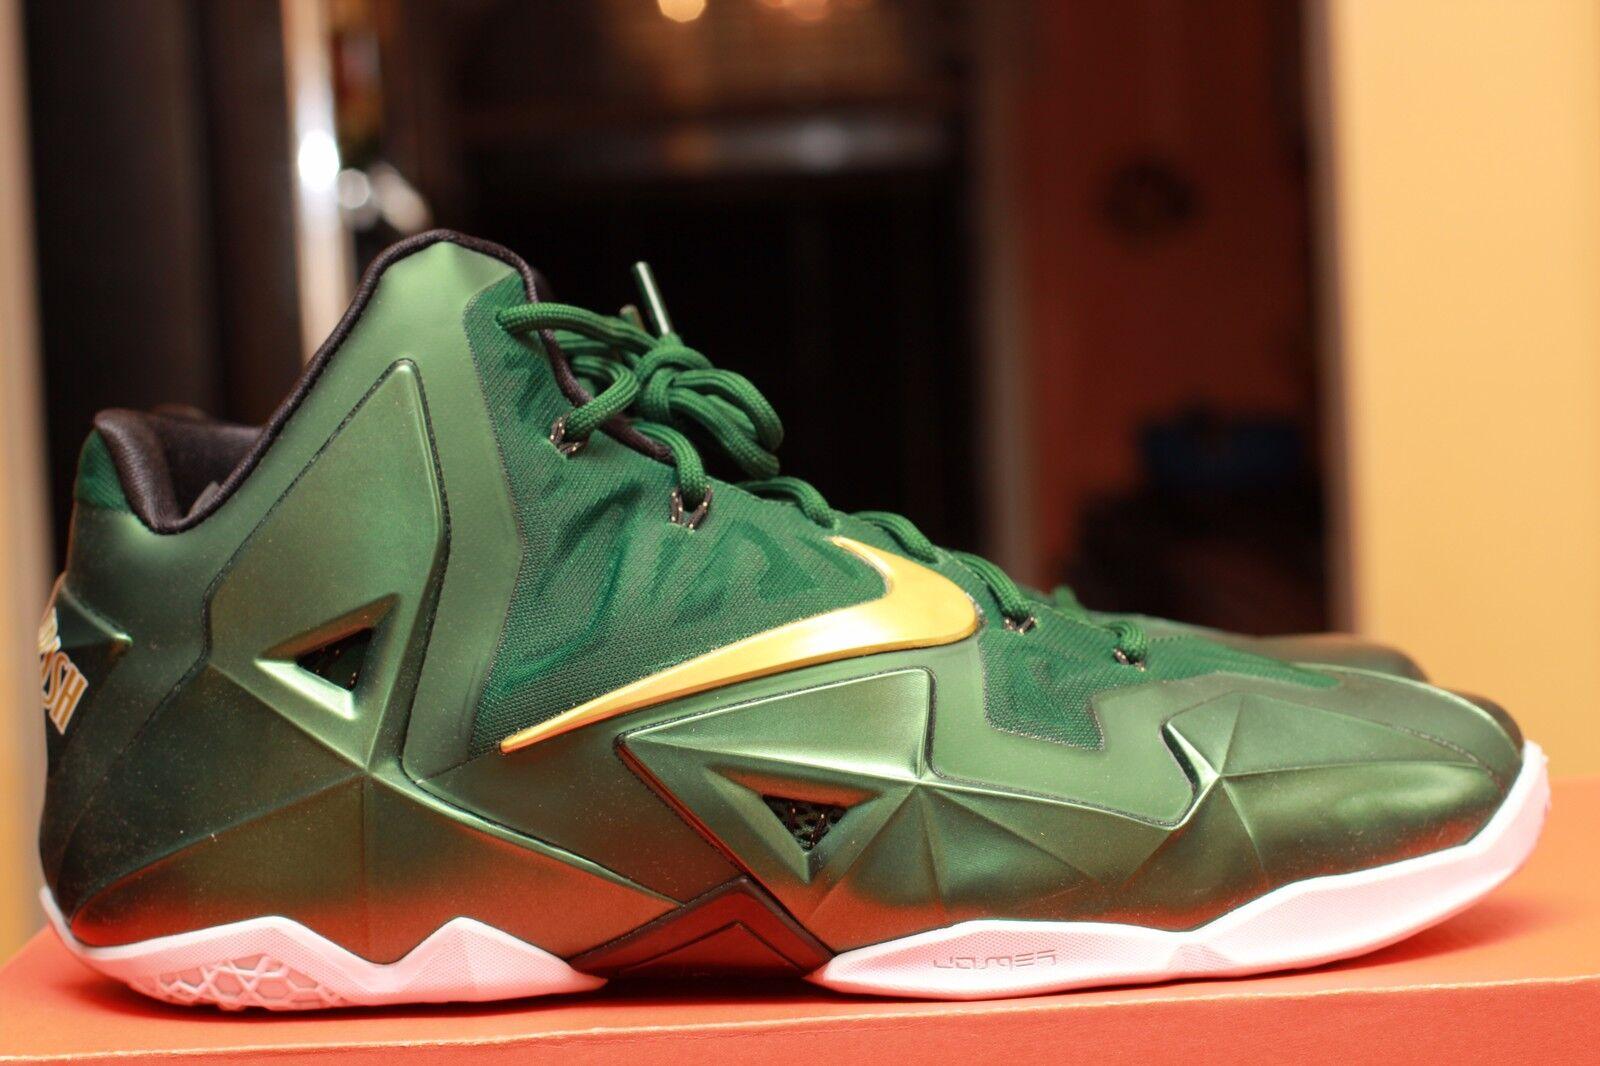 Nike LeBron XI 11 -  SVSM AWAY PE  Promo Sample 100% authentic